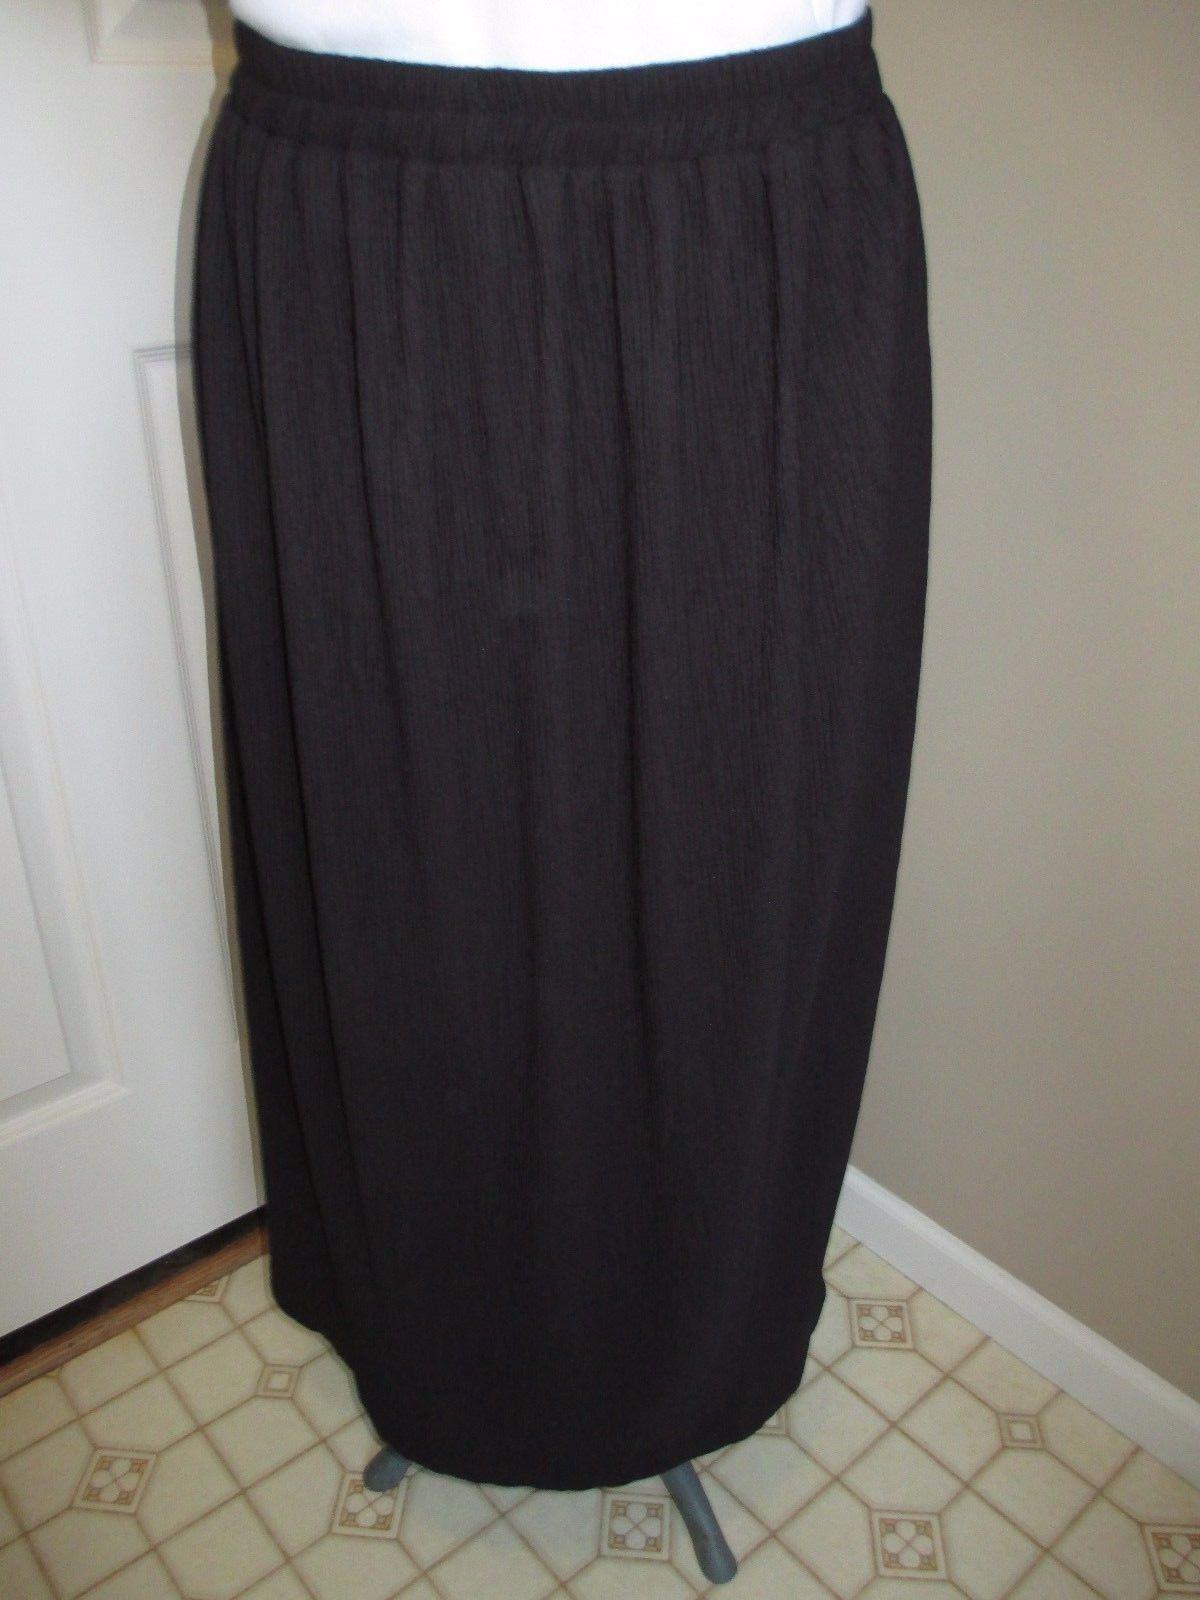 Size 6 Nwt. Worthington Metallic Multicolor Straight Pencil Women Skirt